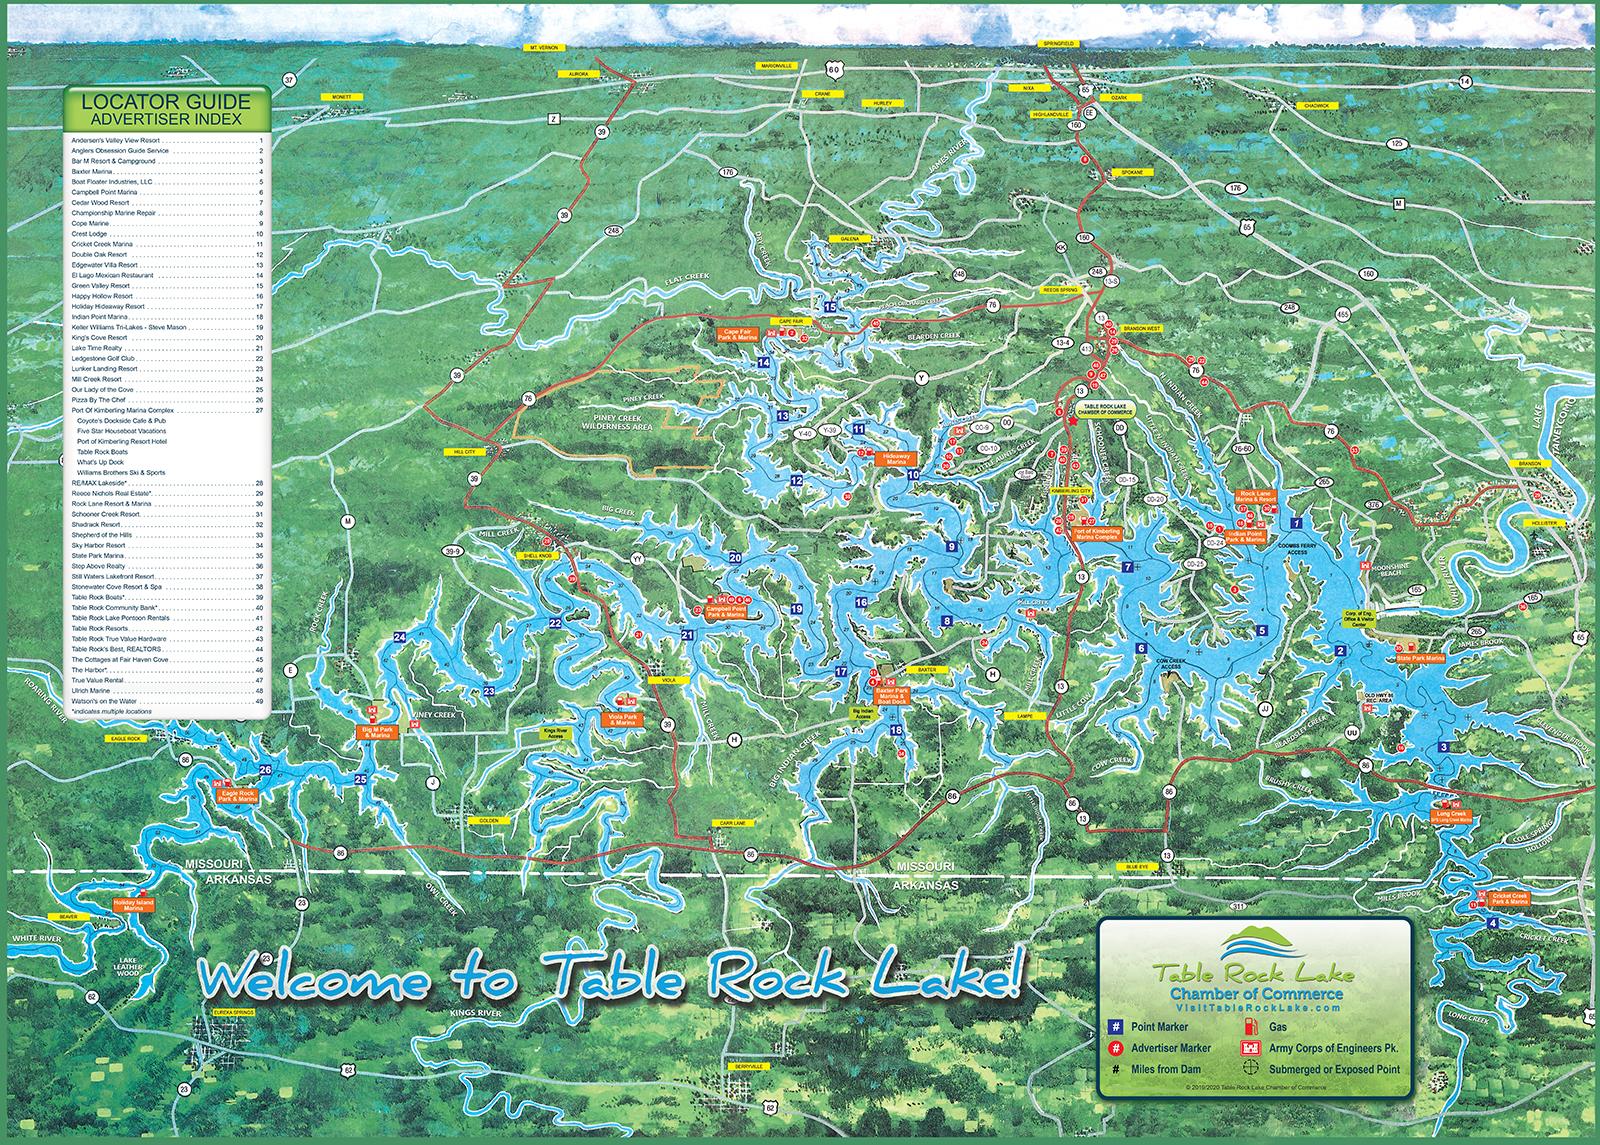 Lake Map - Table Rock Lake Chamber of Commerce